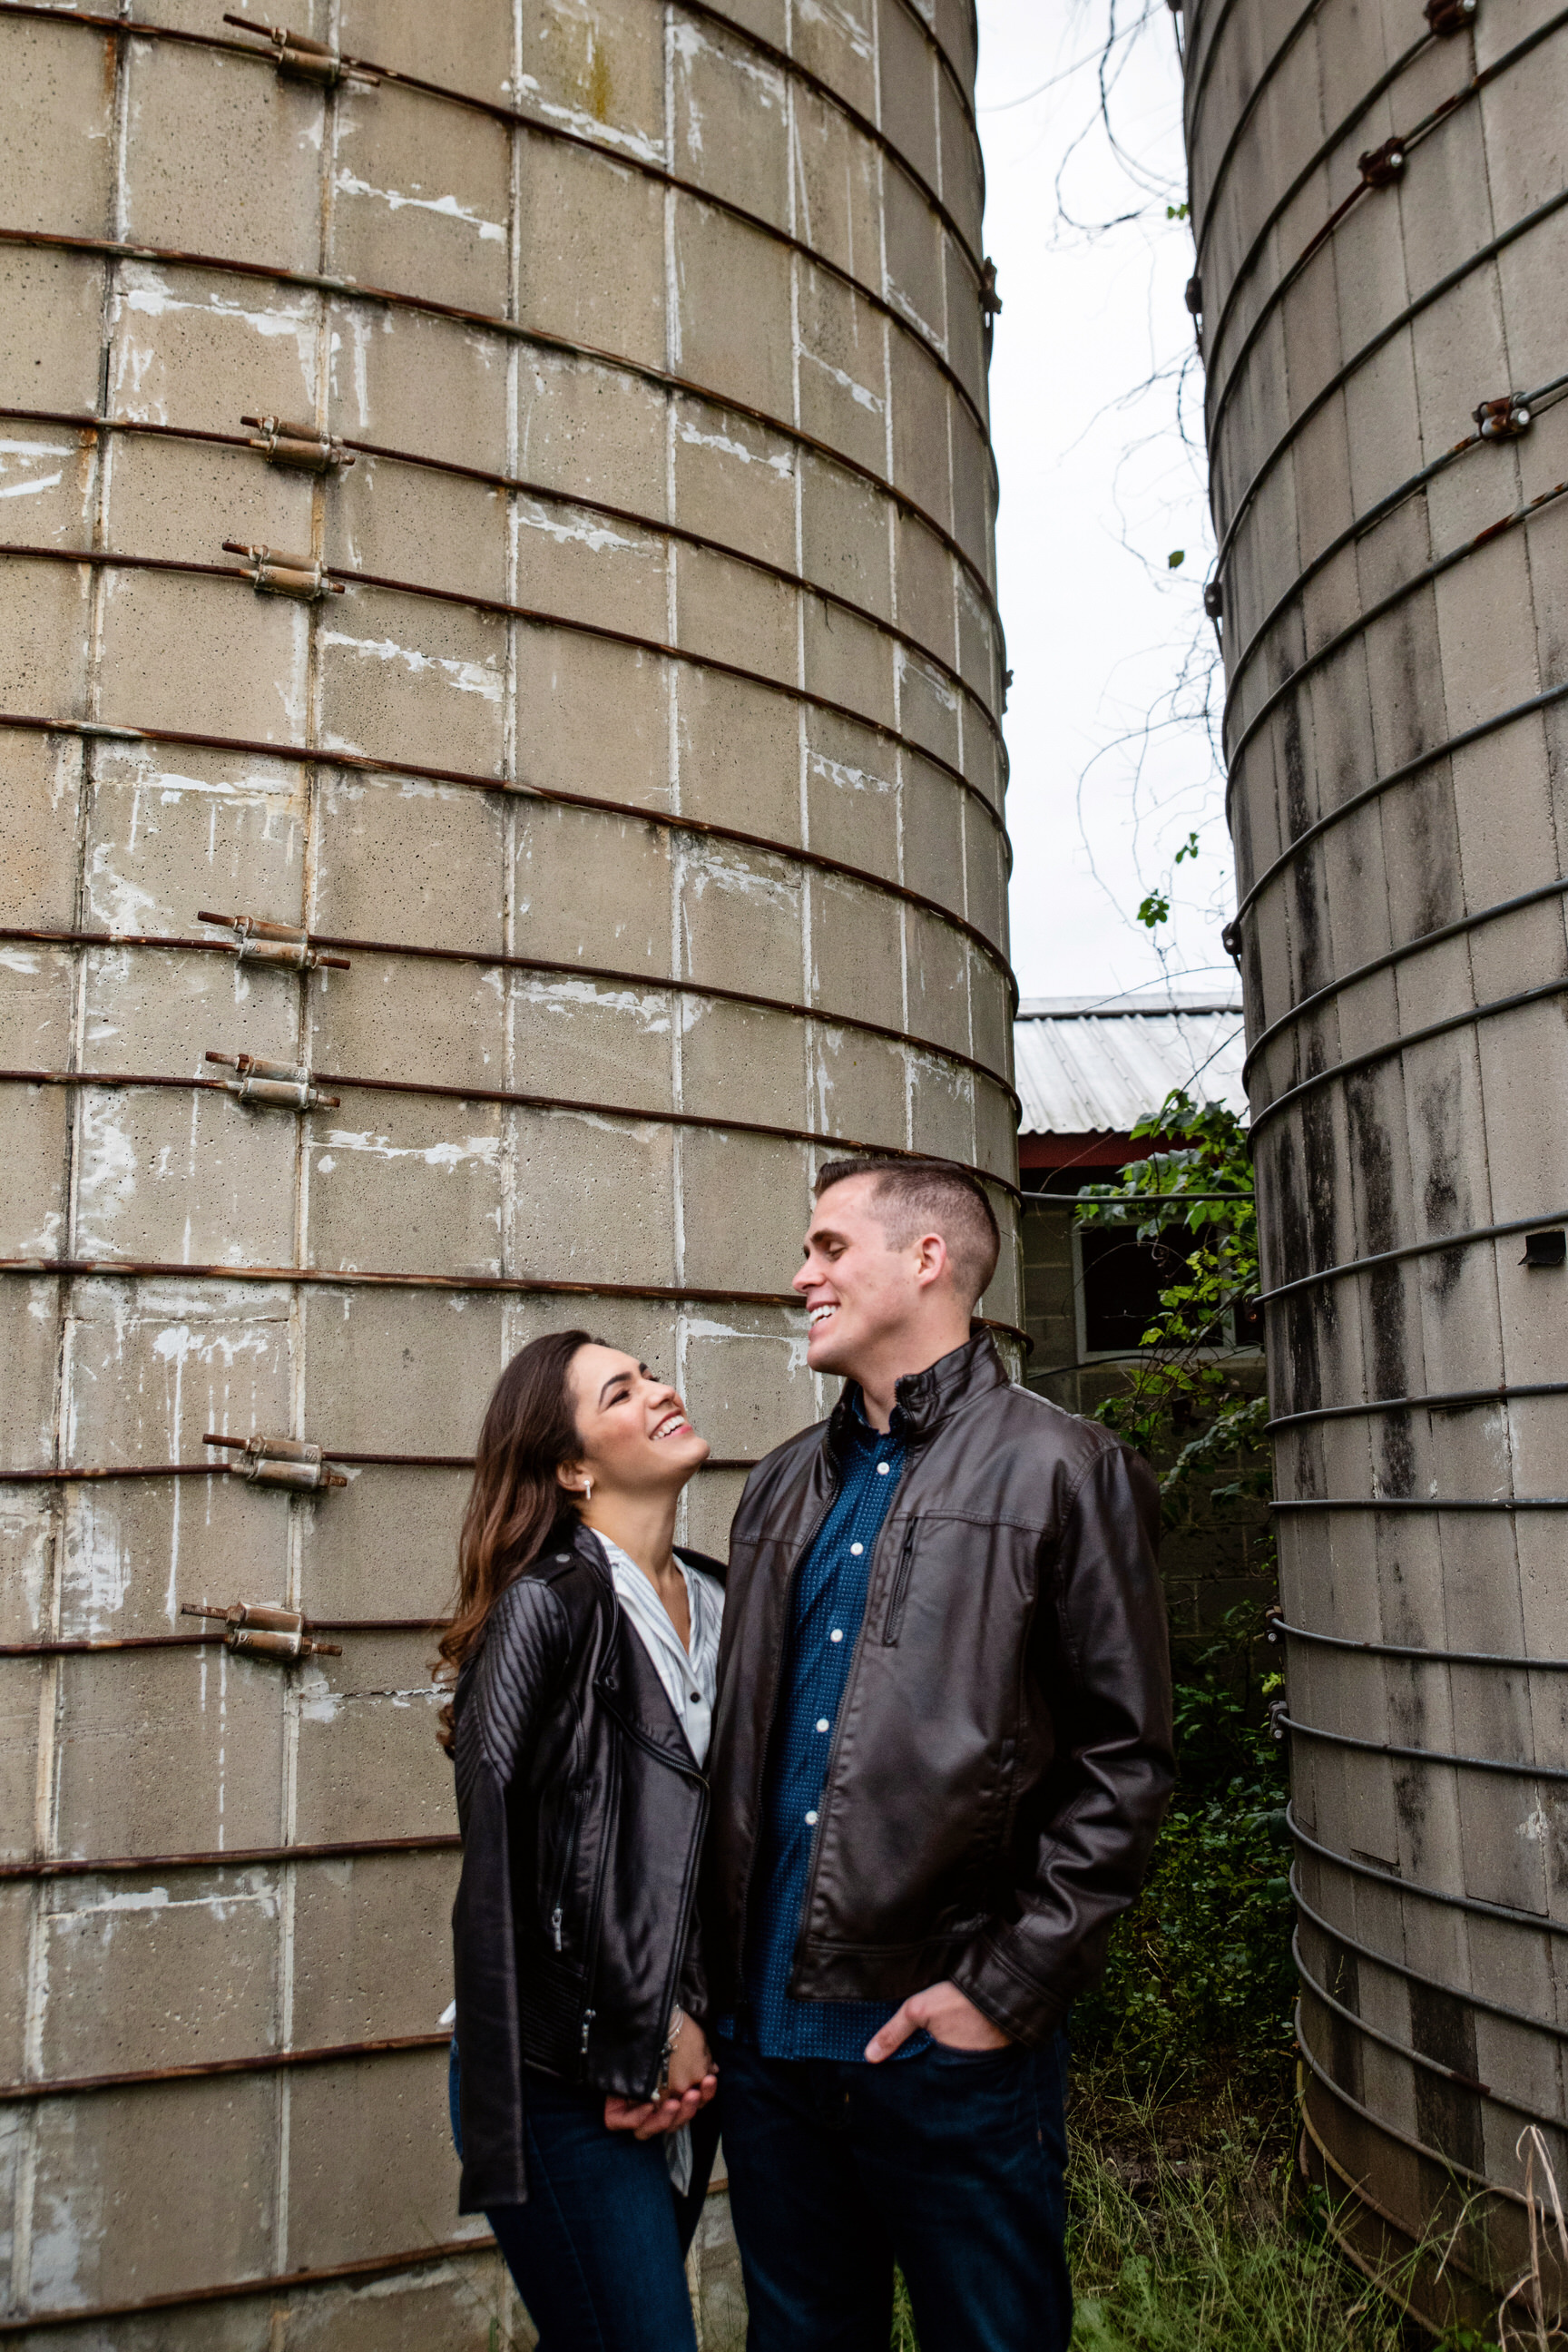 MarylandAdventureEngagement-Brenda&Tony-14.jpg